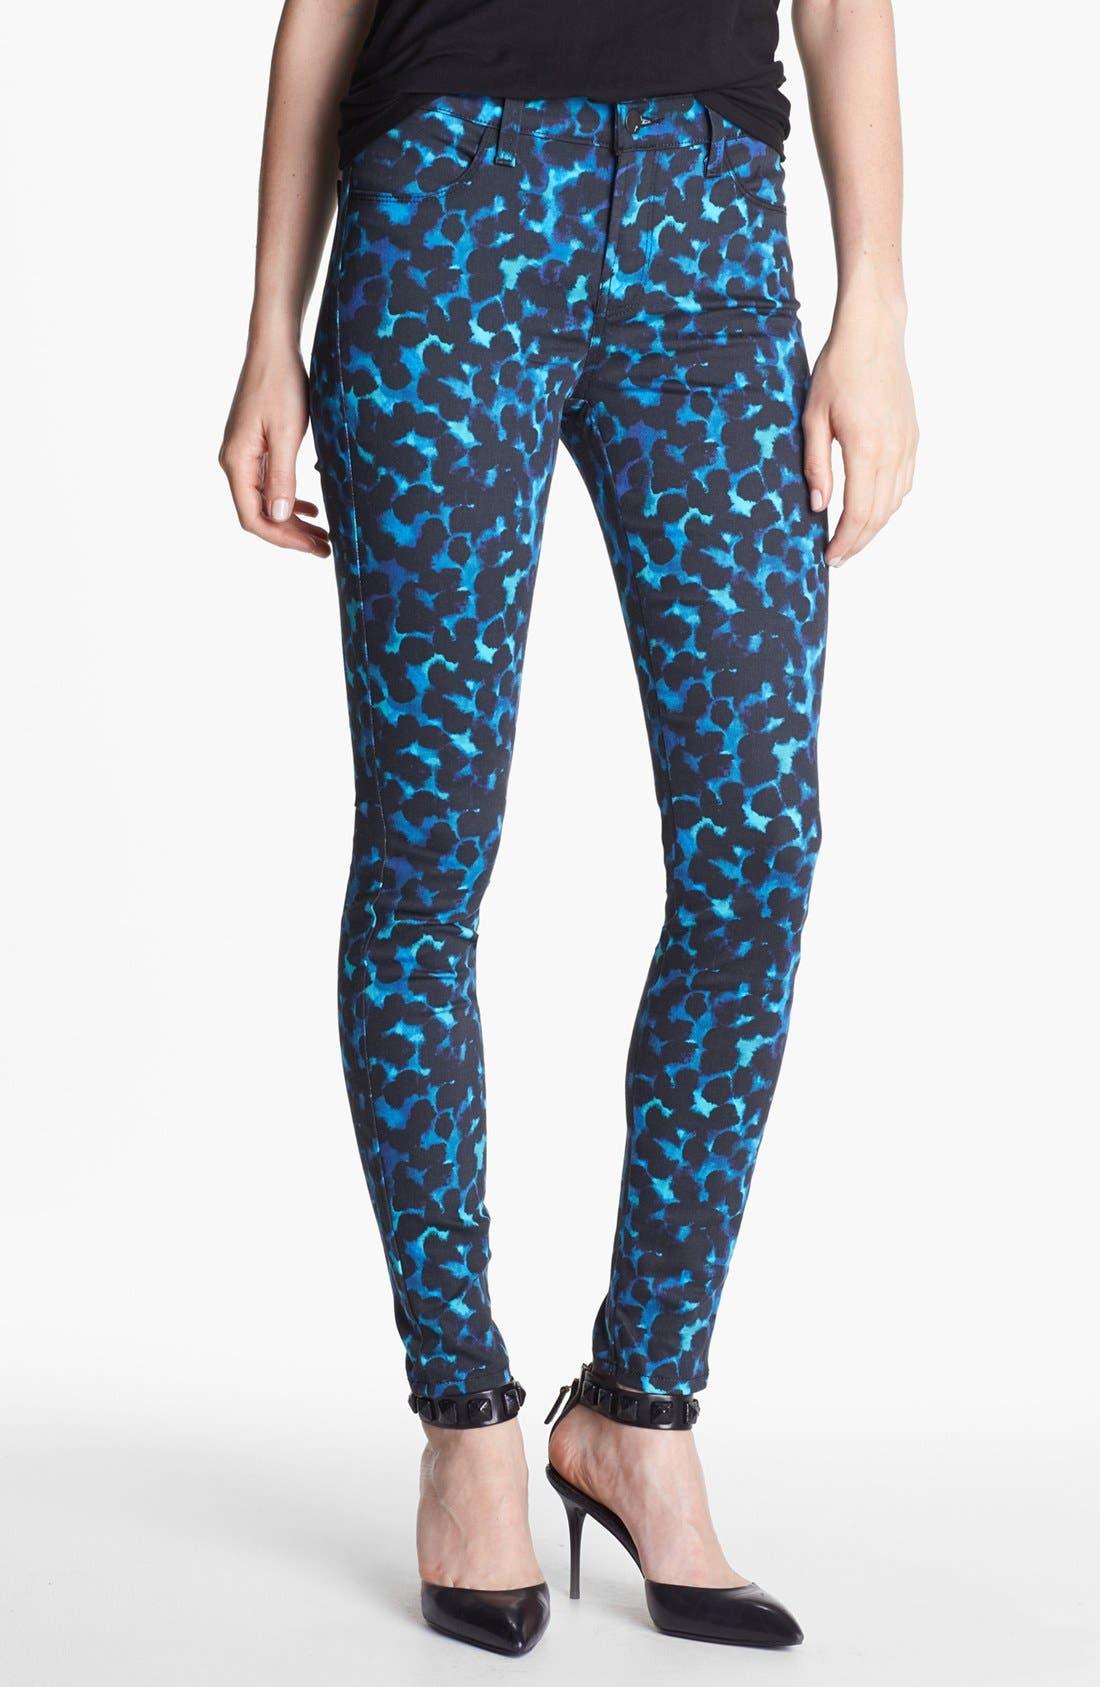 Alternate Image 1 Selected - J Brand Print Super Skinny Jeans (Indigo Ink)